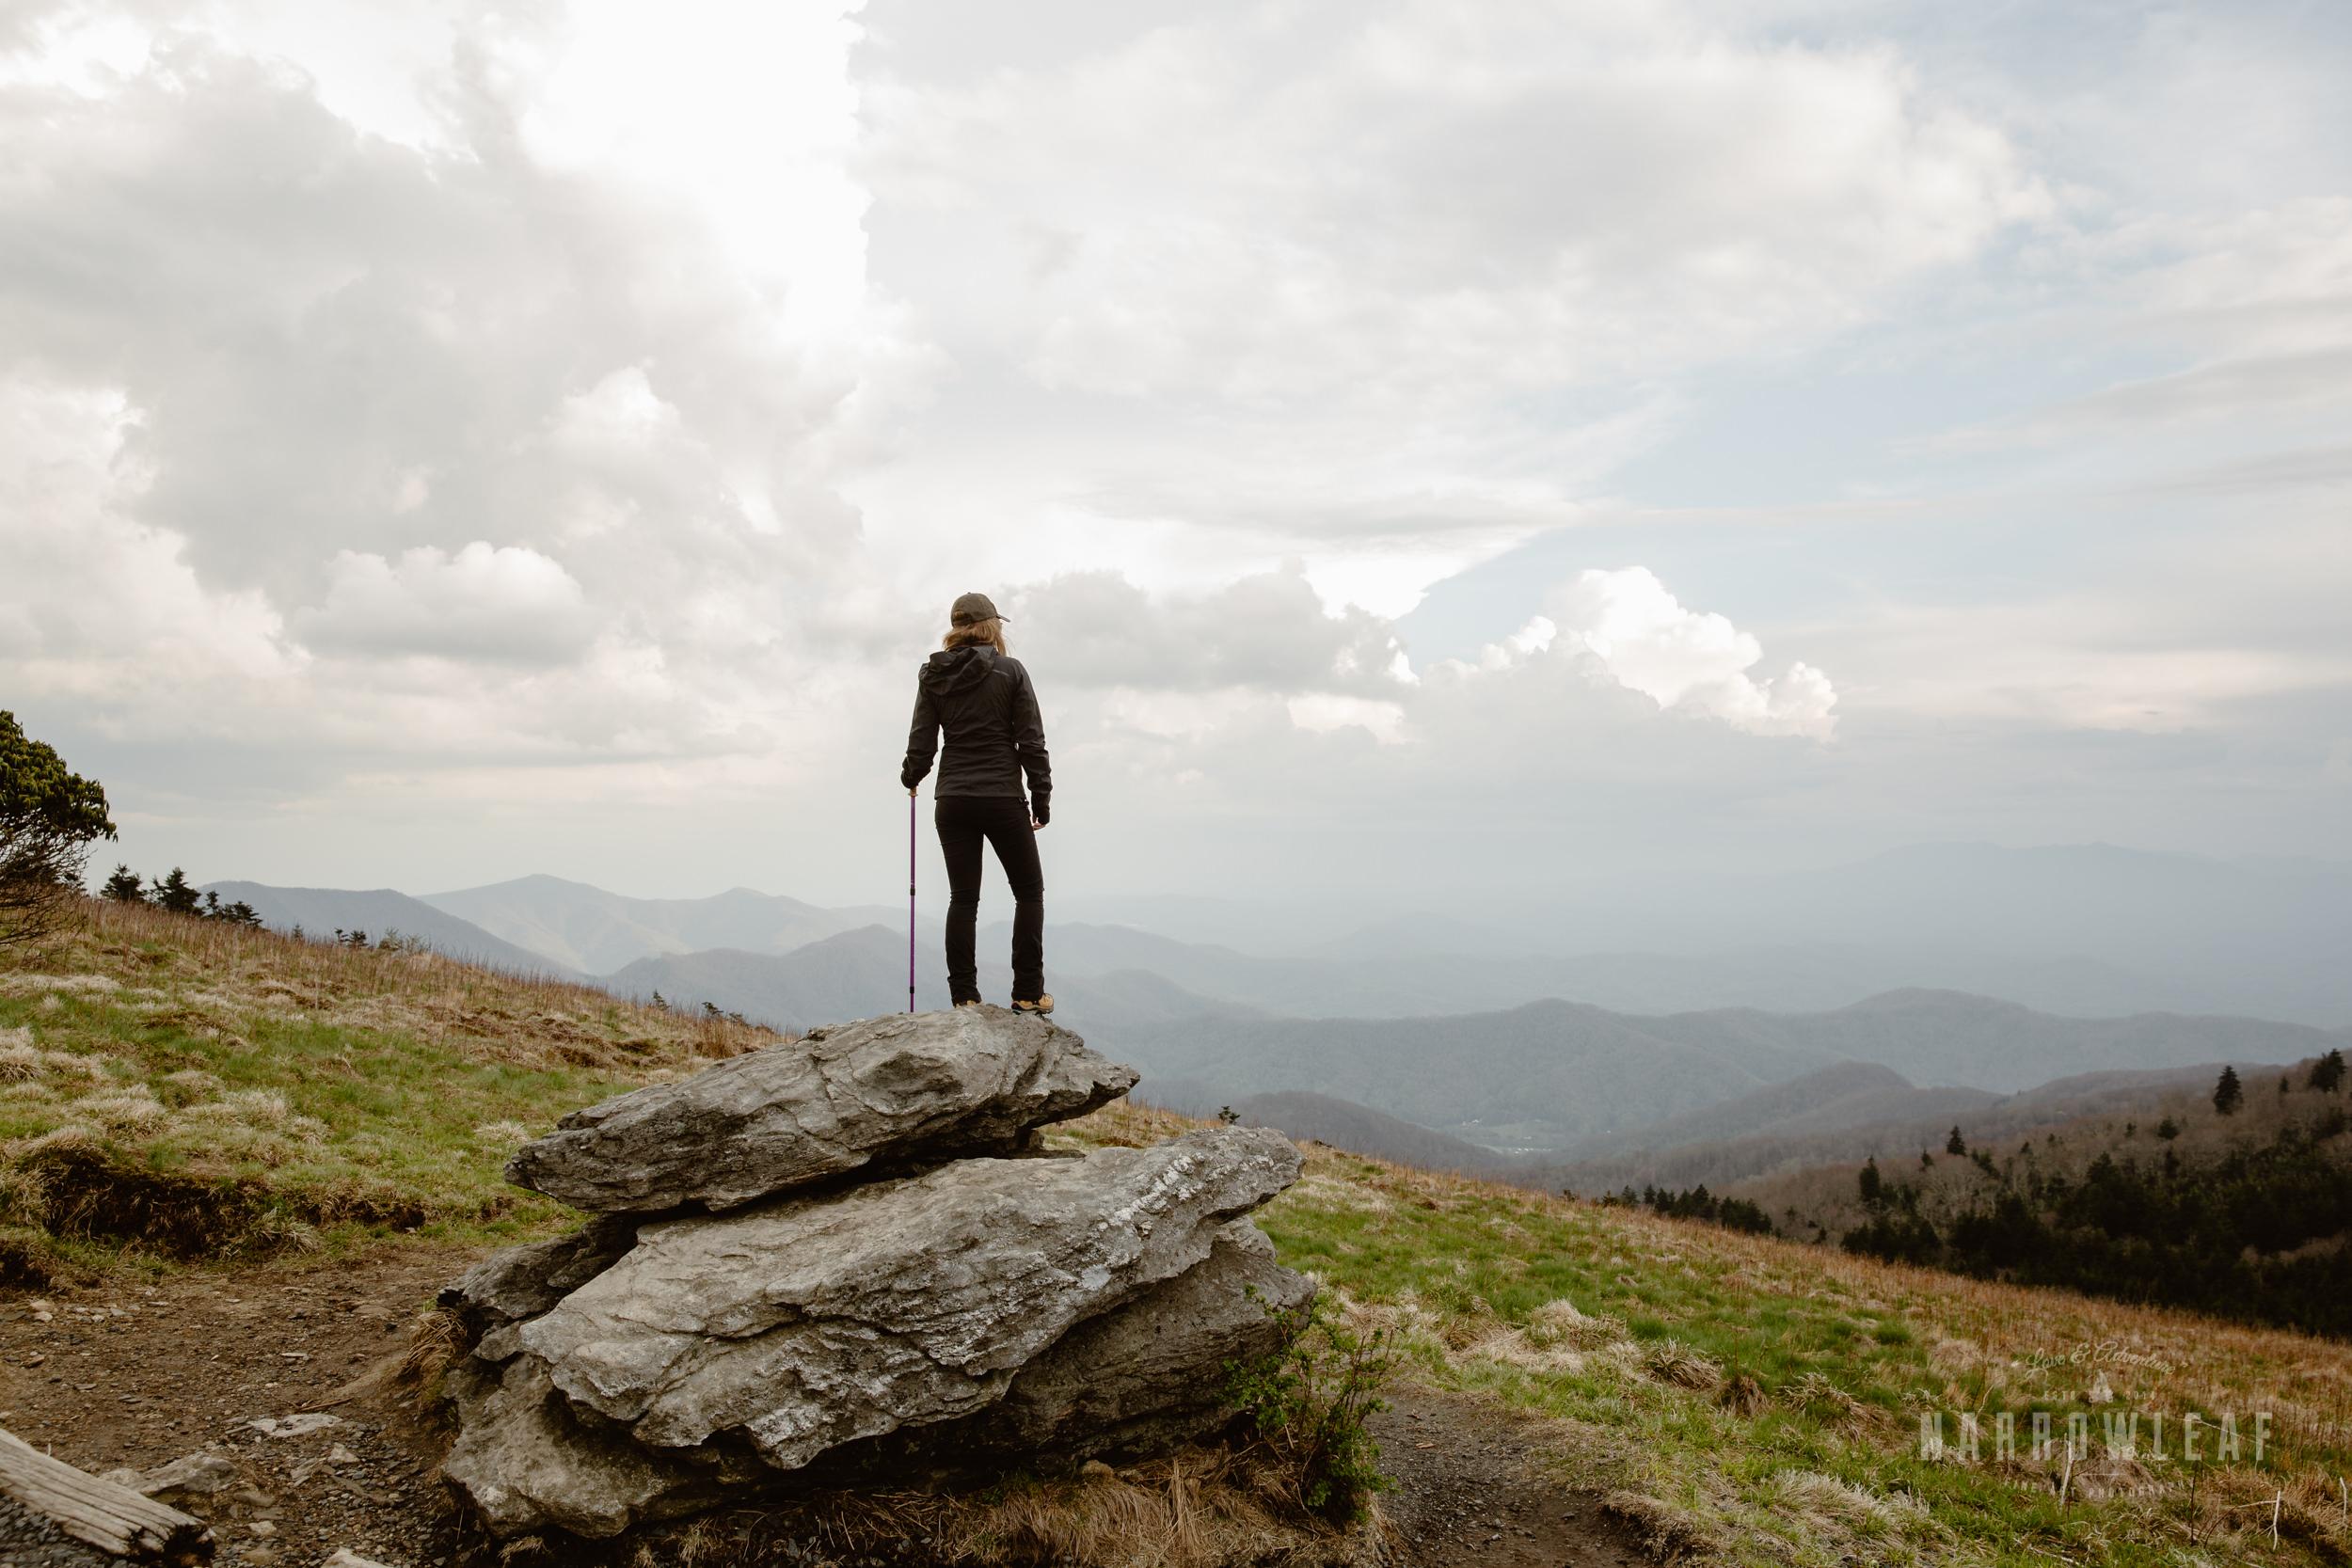 Hiking-Big-Bald-Mountain-Appalachian-Trail-in-Tennessee-Narrowleaf_Love_and_Adventure_Photography-3244.jpg